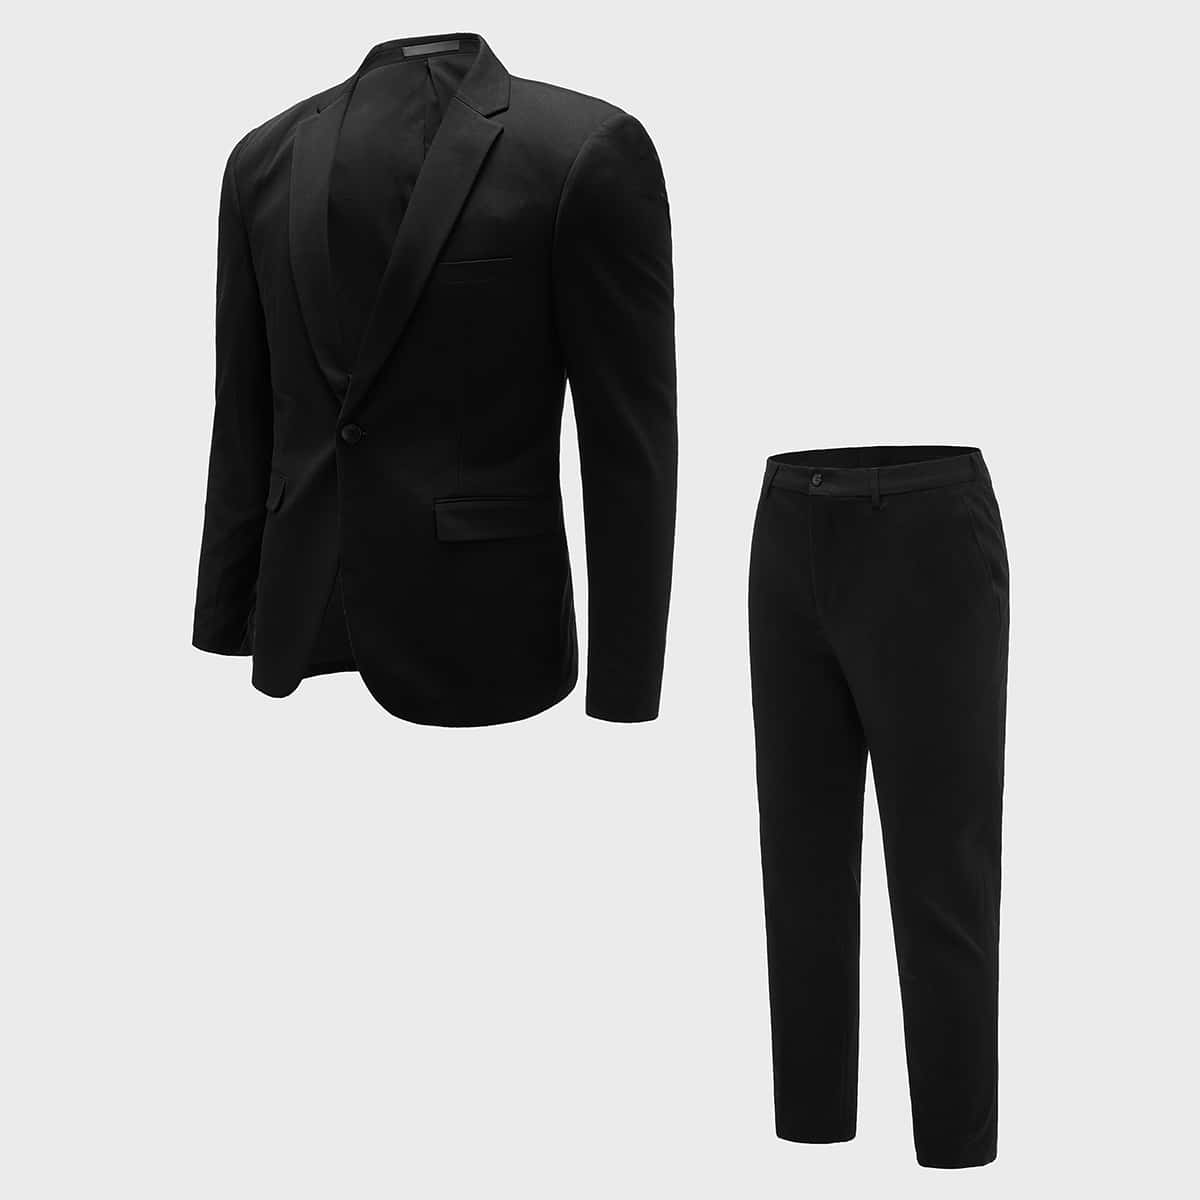 Men Solid Single Button Blazer & Tailored Pants